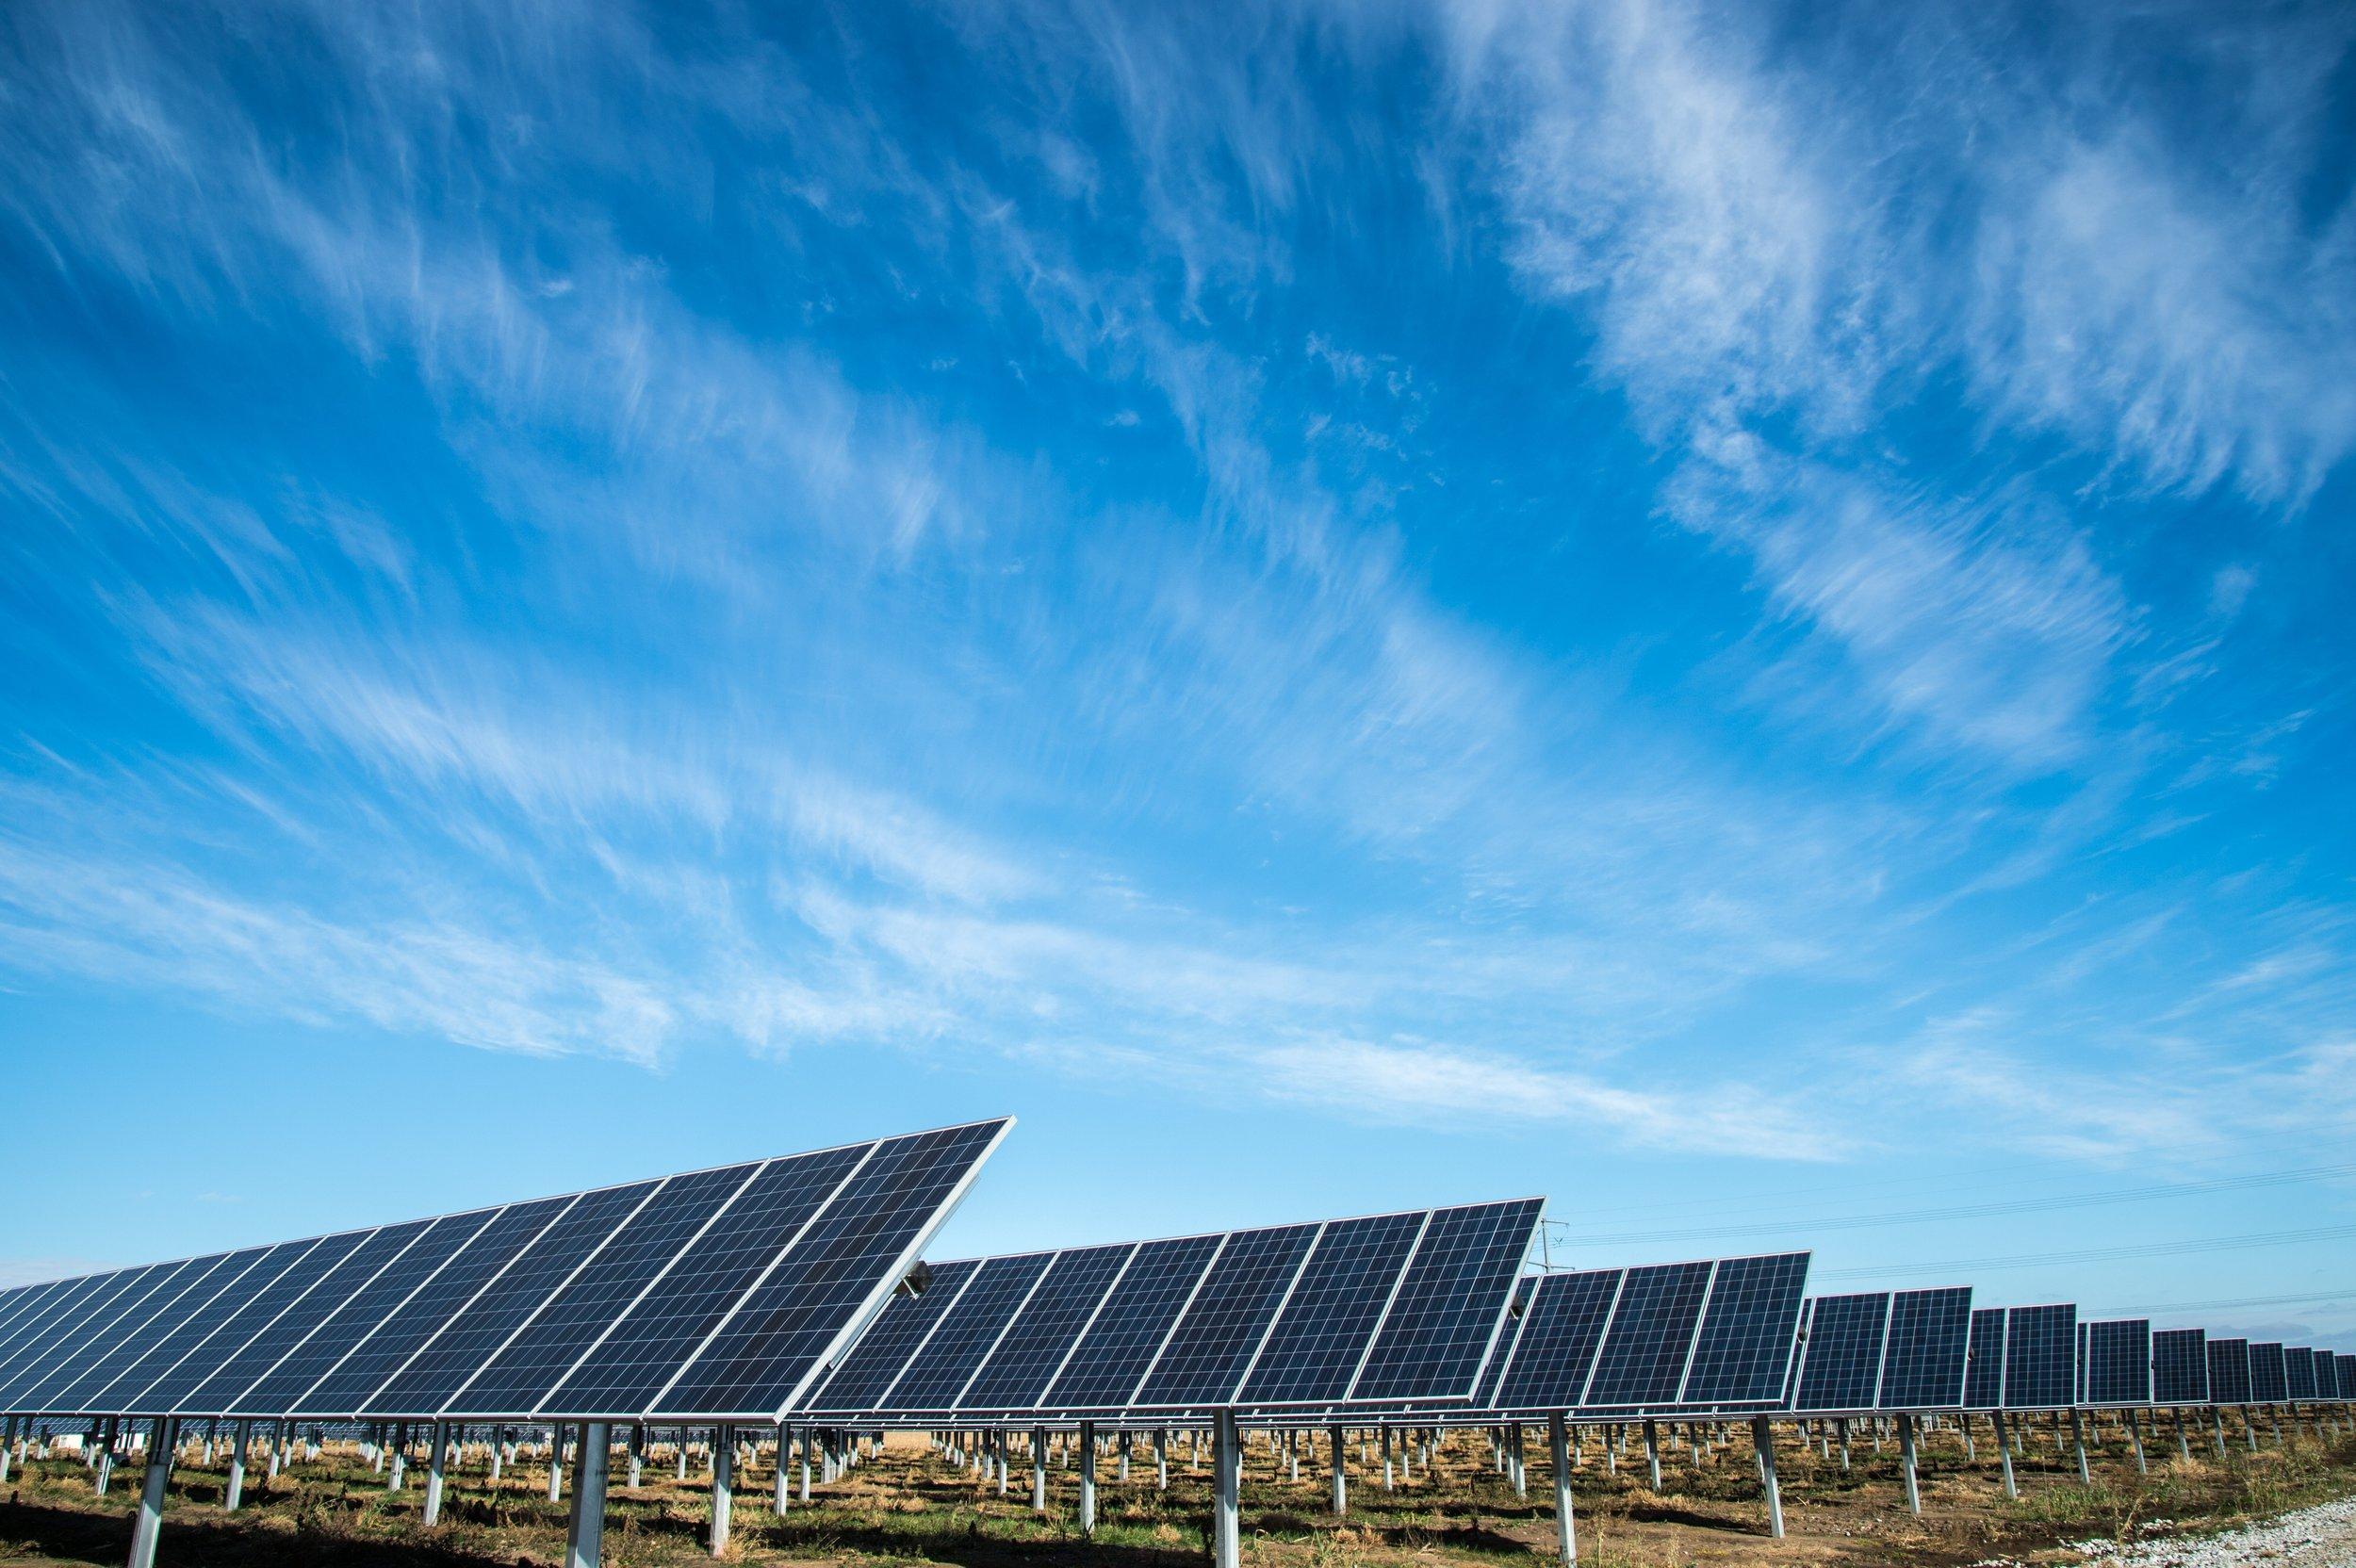 Solar Panels 3 Aug 2015 (NYT).jpg